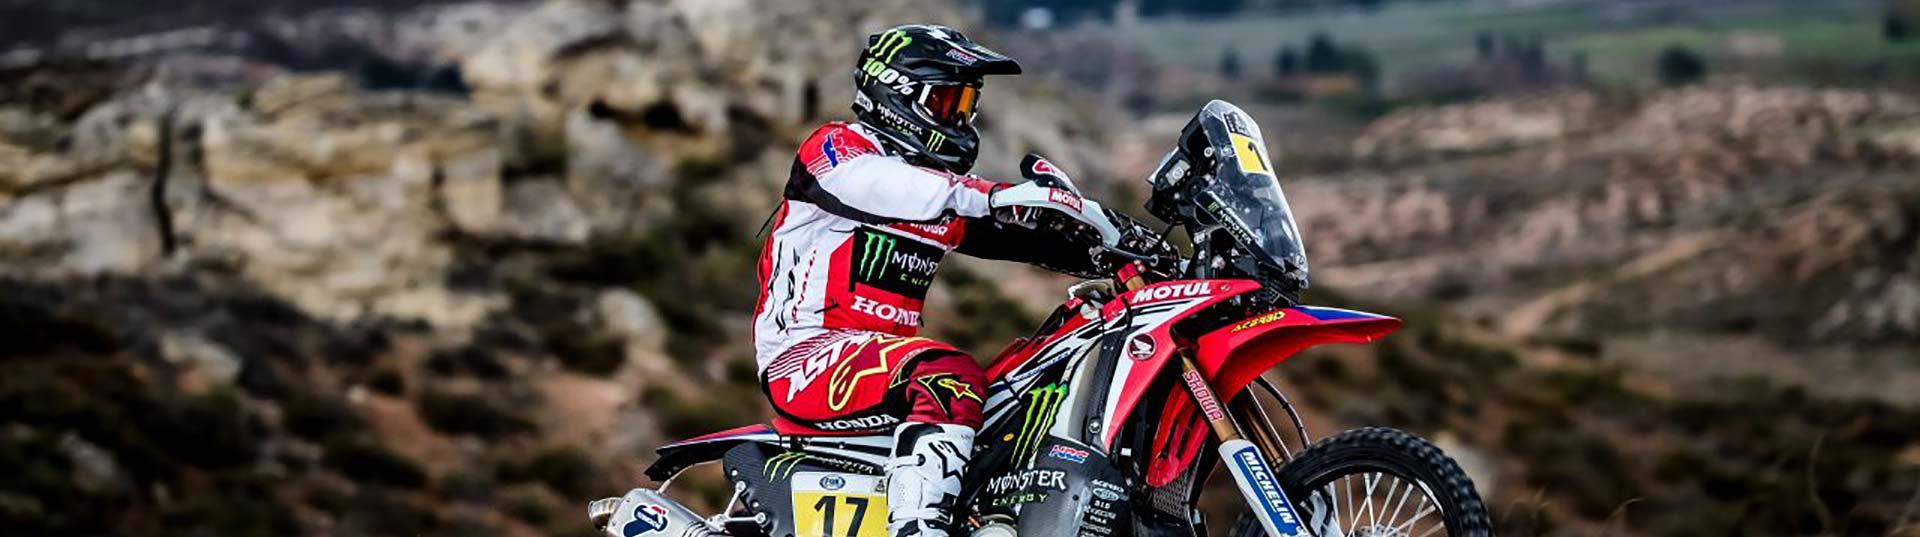 Vencedor Motos Dakar Dia 1